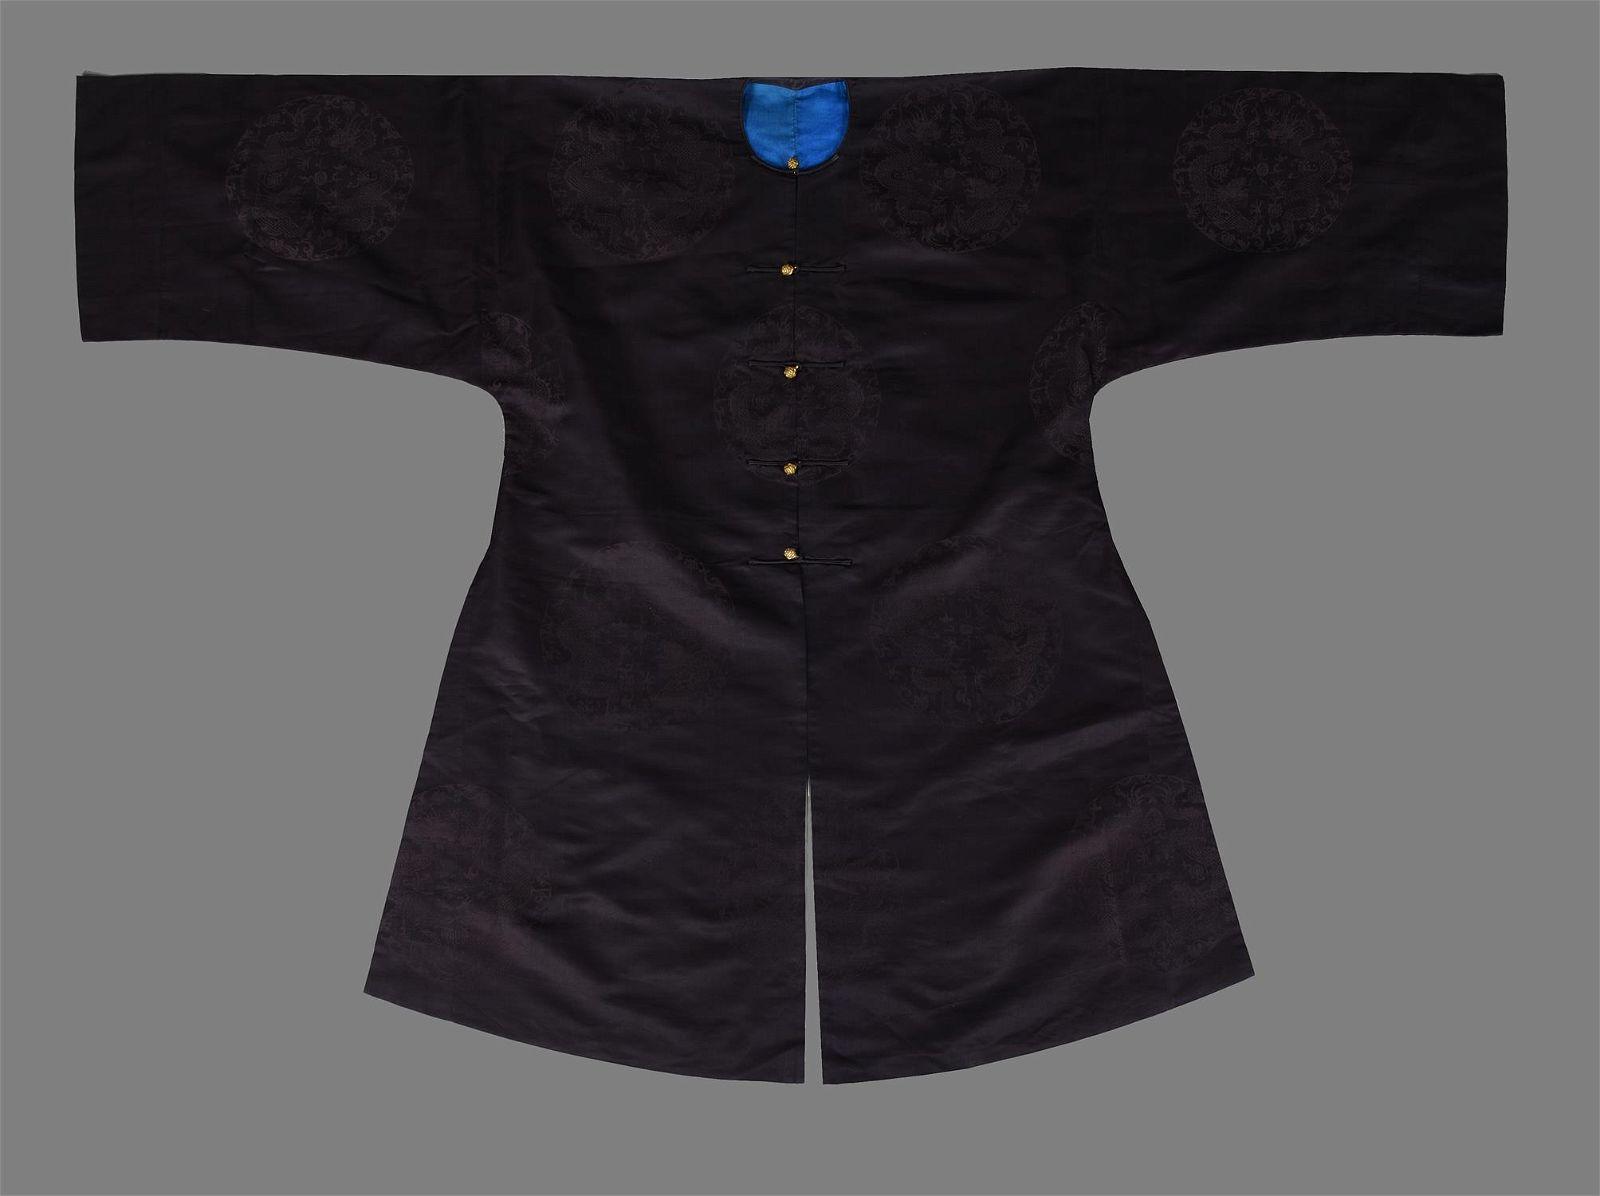 A Chinese Mandarin's surcoat